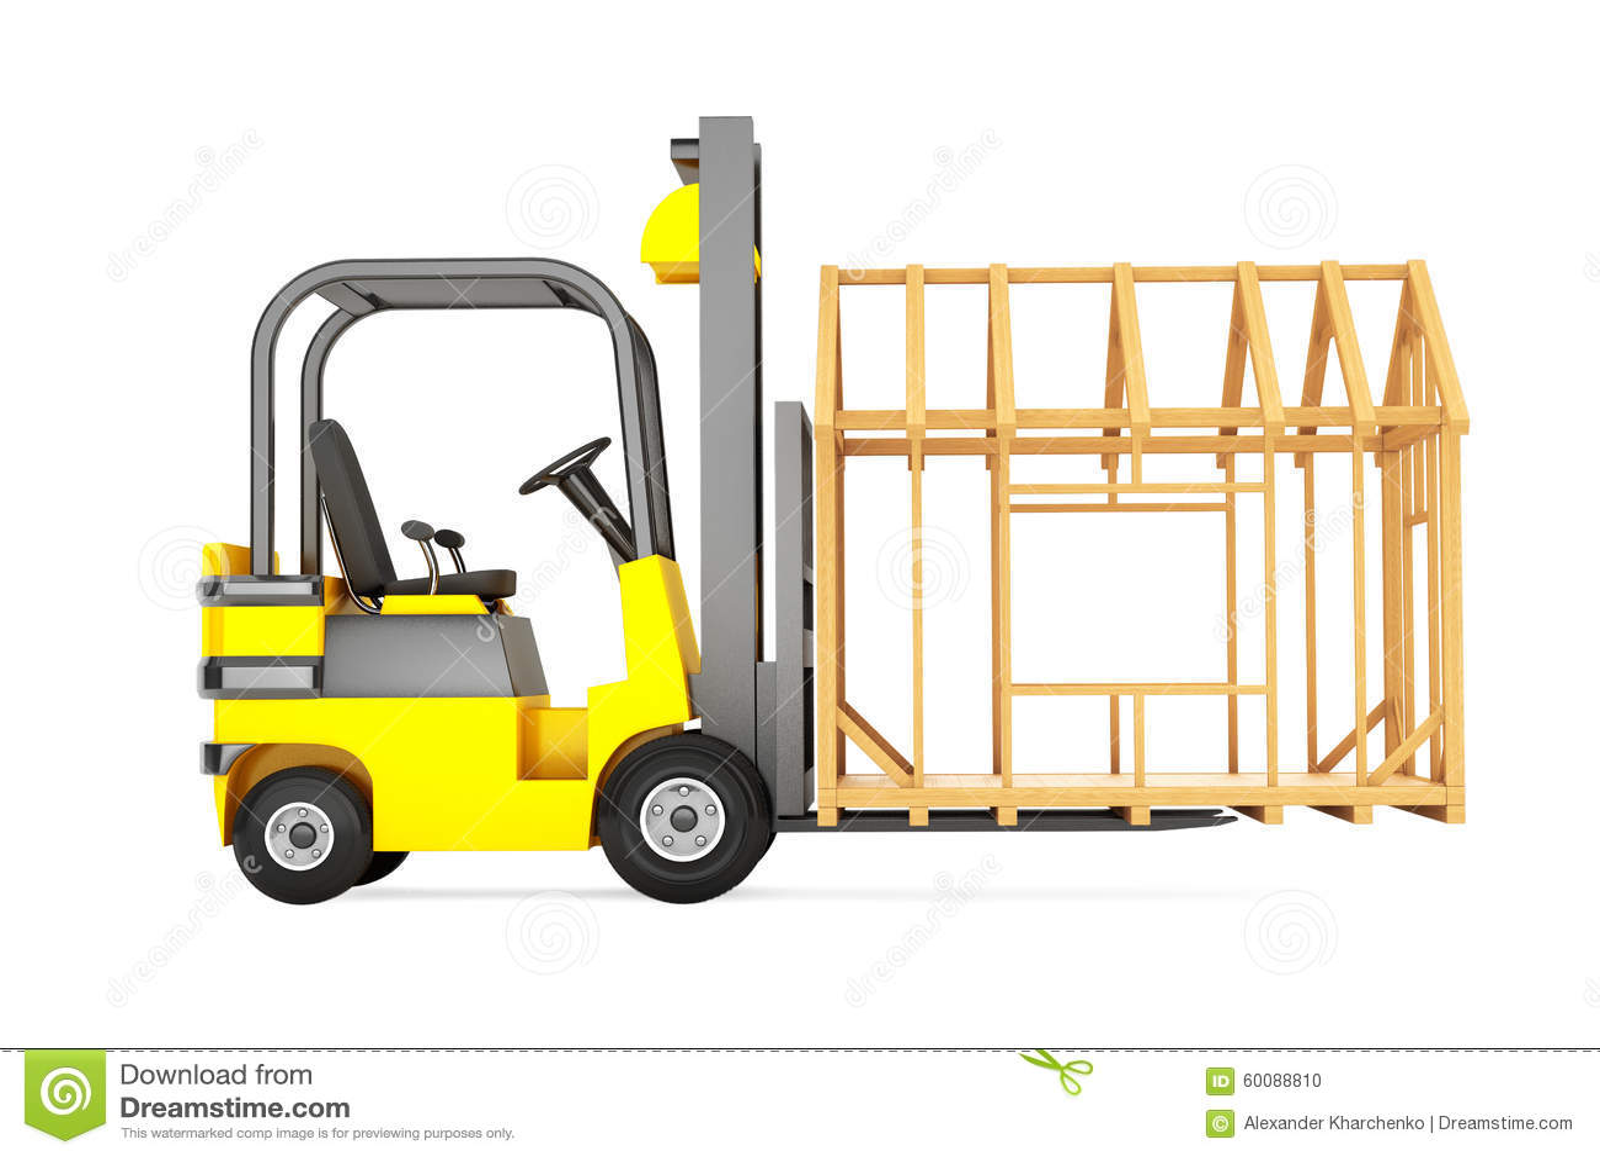 Forklift Truck Moving Frame House Stock Illustration - Illustration ...